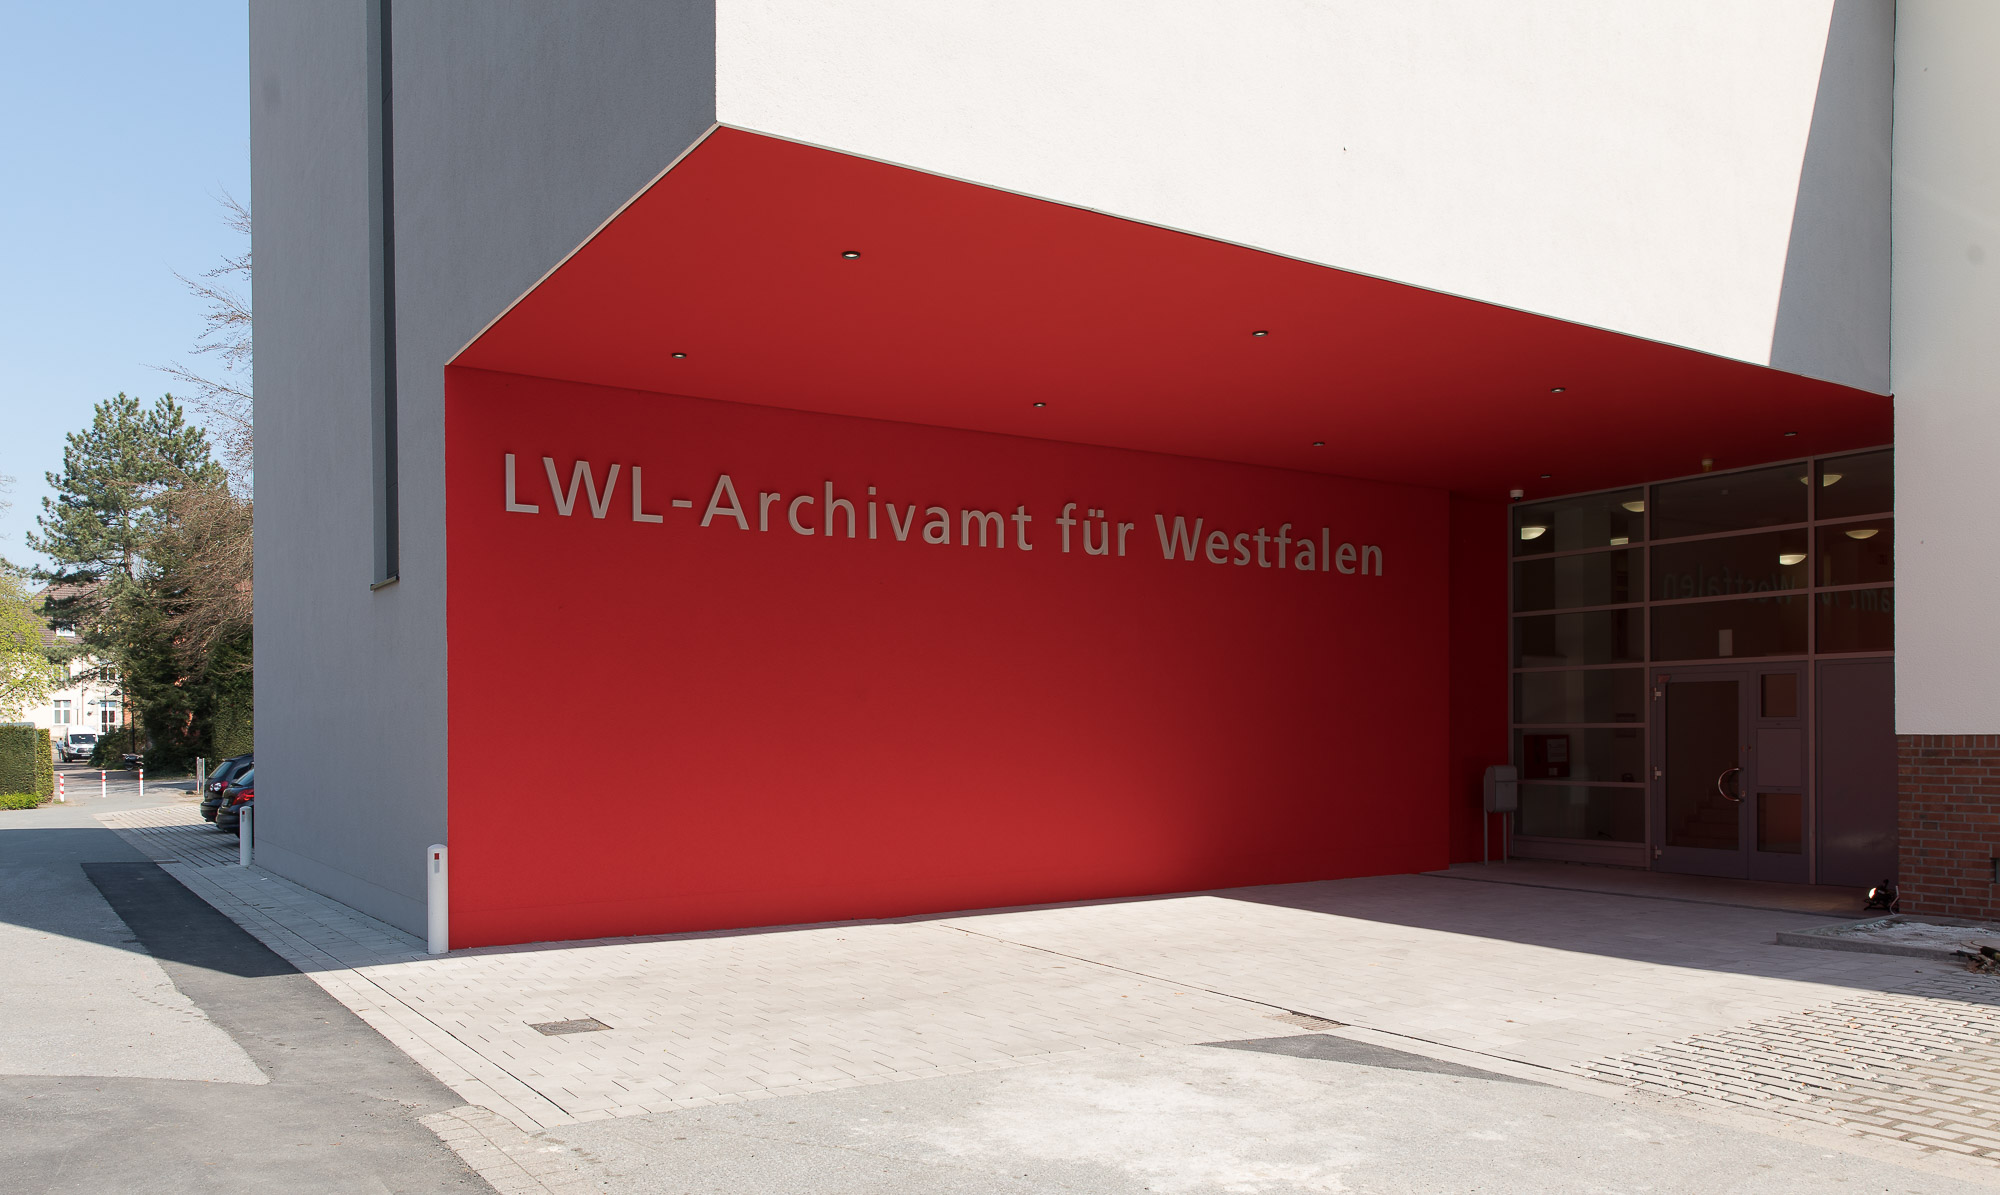 110e55e7b3 Eingang zum LWL-Archivamt für Westfalen (Foto: Markus Bomholt)